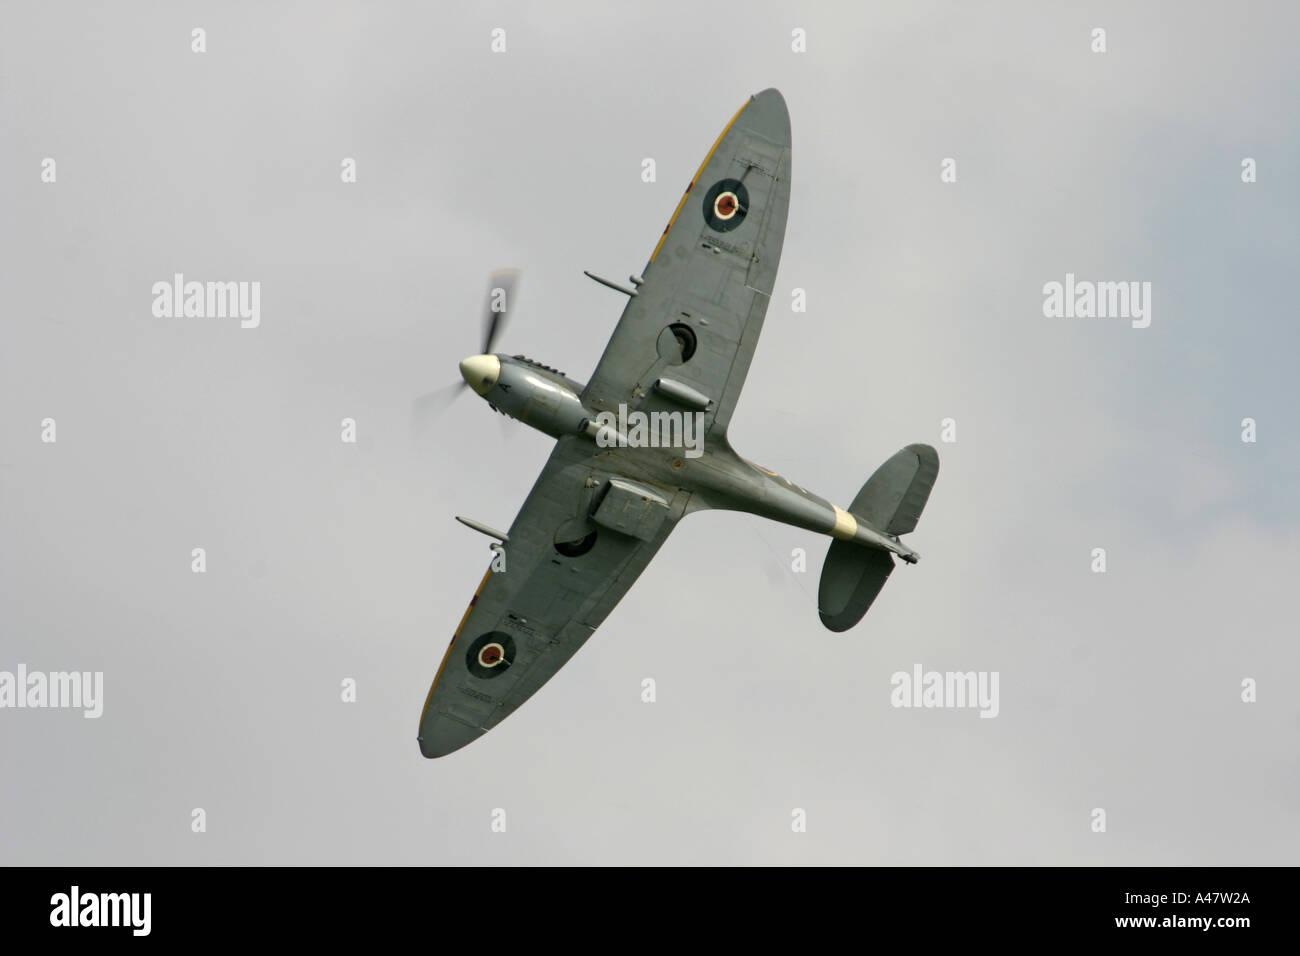 Supermarine Spitfire at Shuttleworth Air Display Old Warden Bedfordshire England - Stock Image